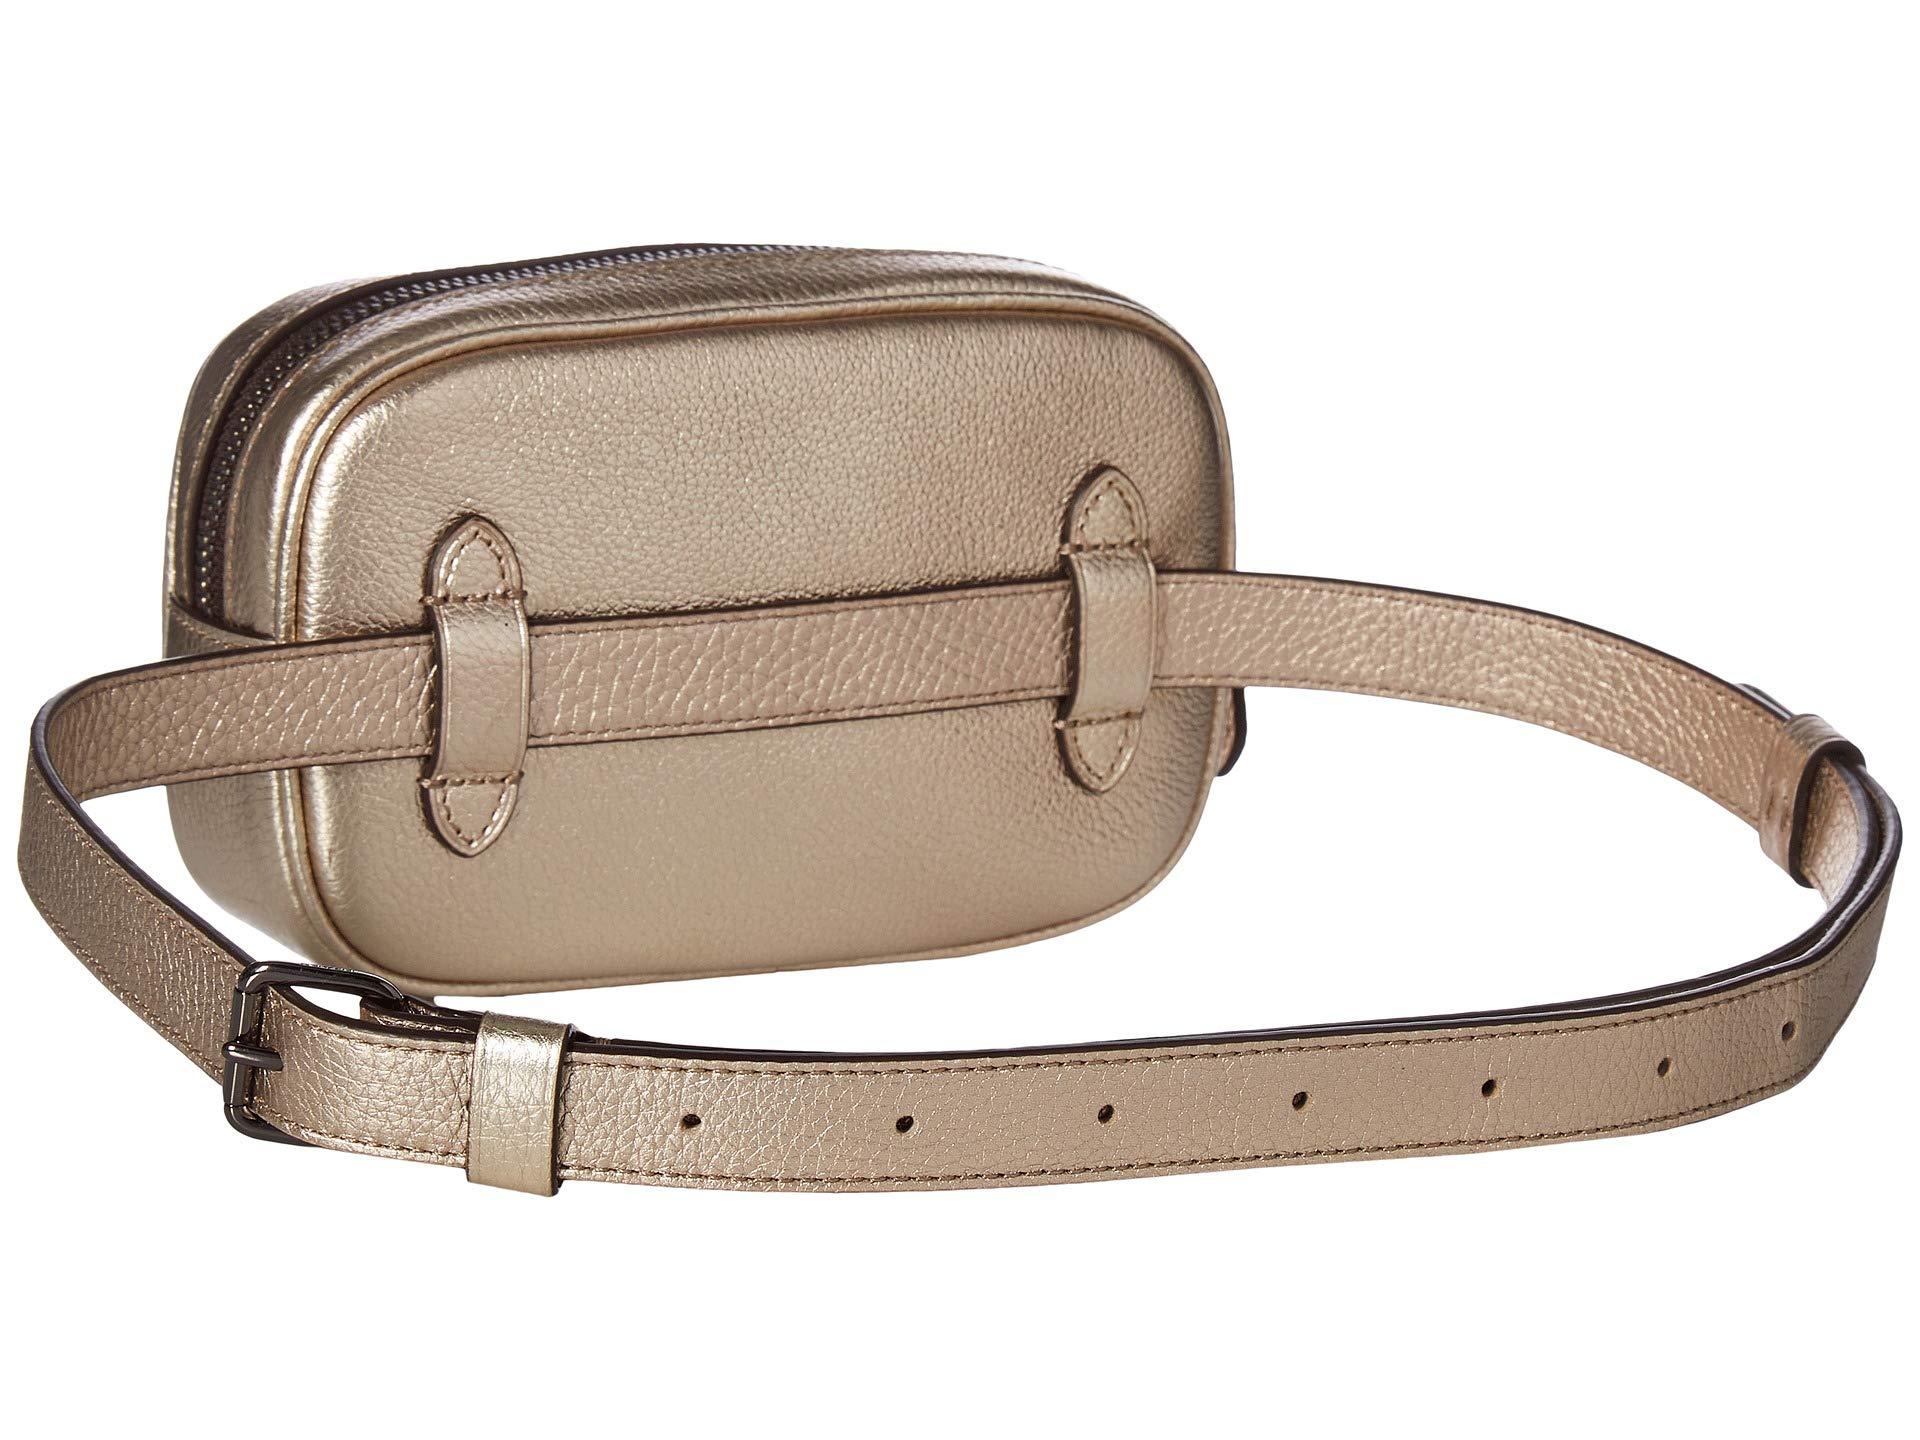 Bag platinum Coach Dressy Metallic Gm Leather Belt Fcvcr07